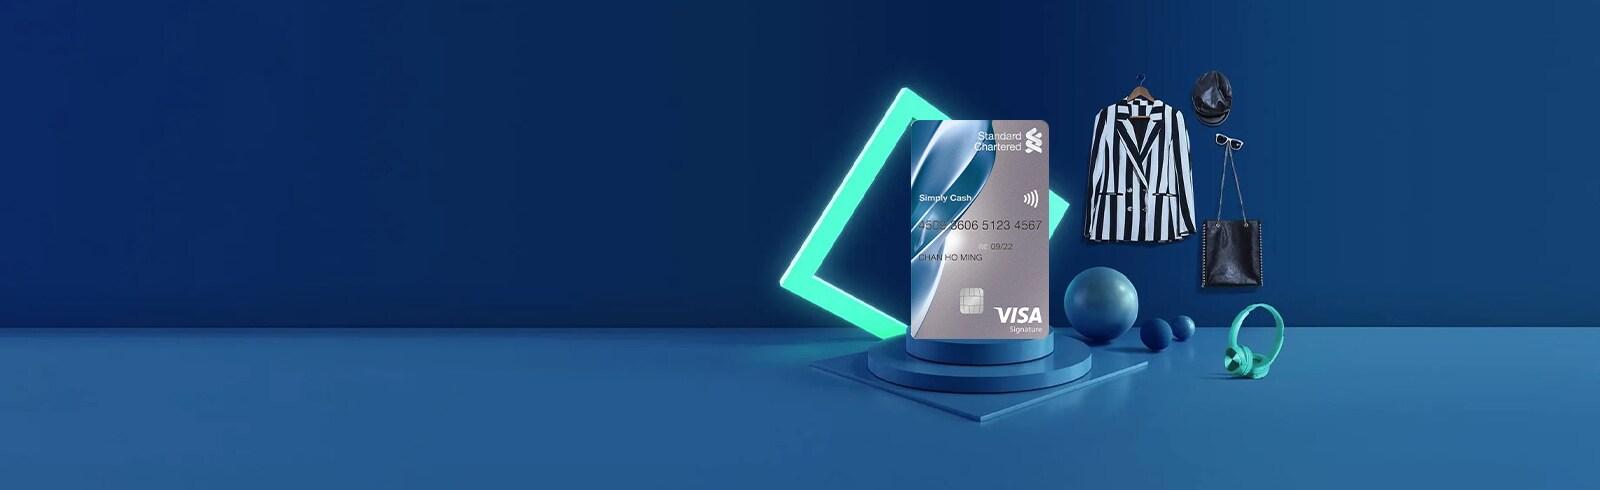 Simply Cash Card 在藍色背景的中心